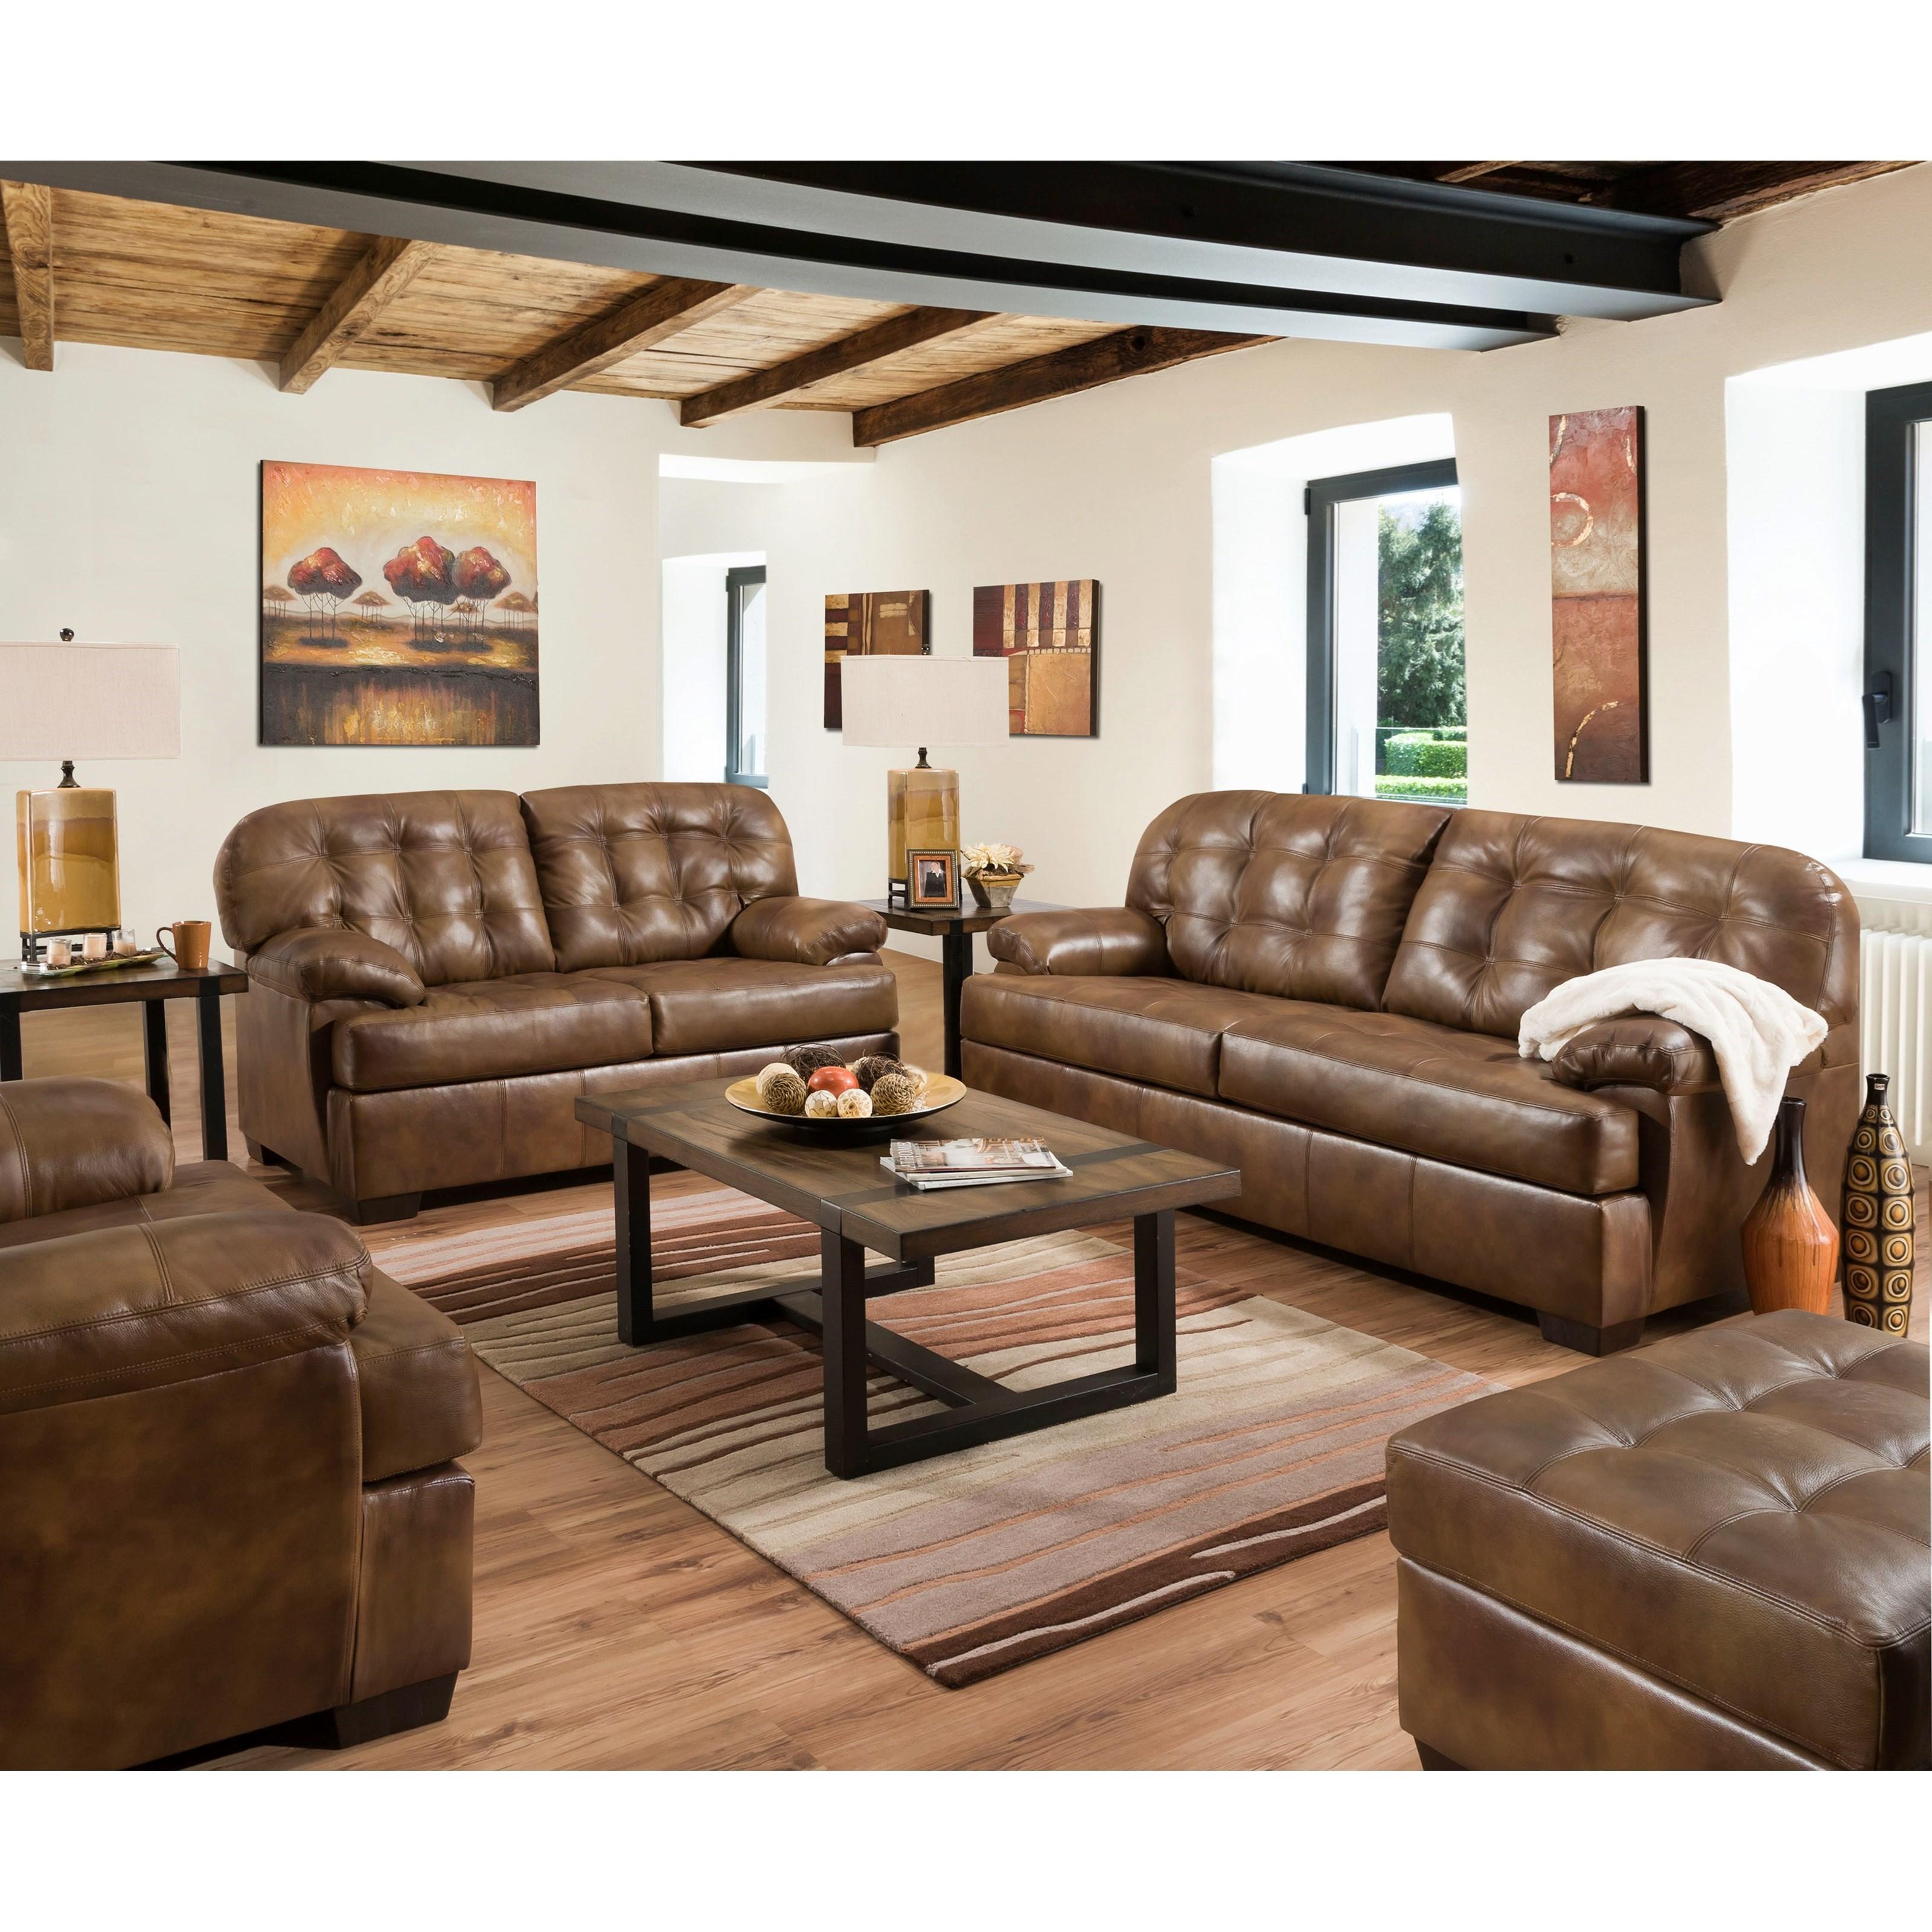 Furniture Industries: United Furniture Industries 2037 2037-02 Casual Loveseat